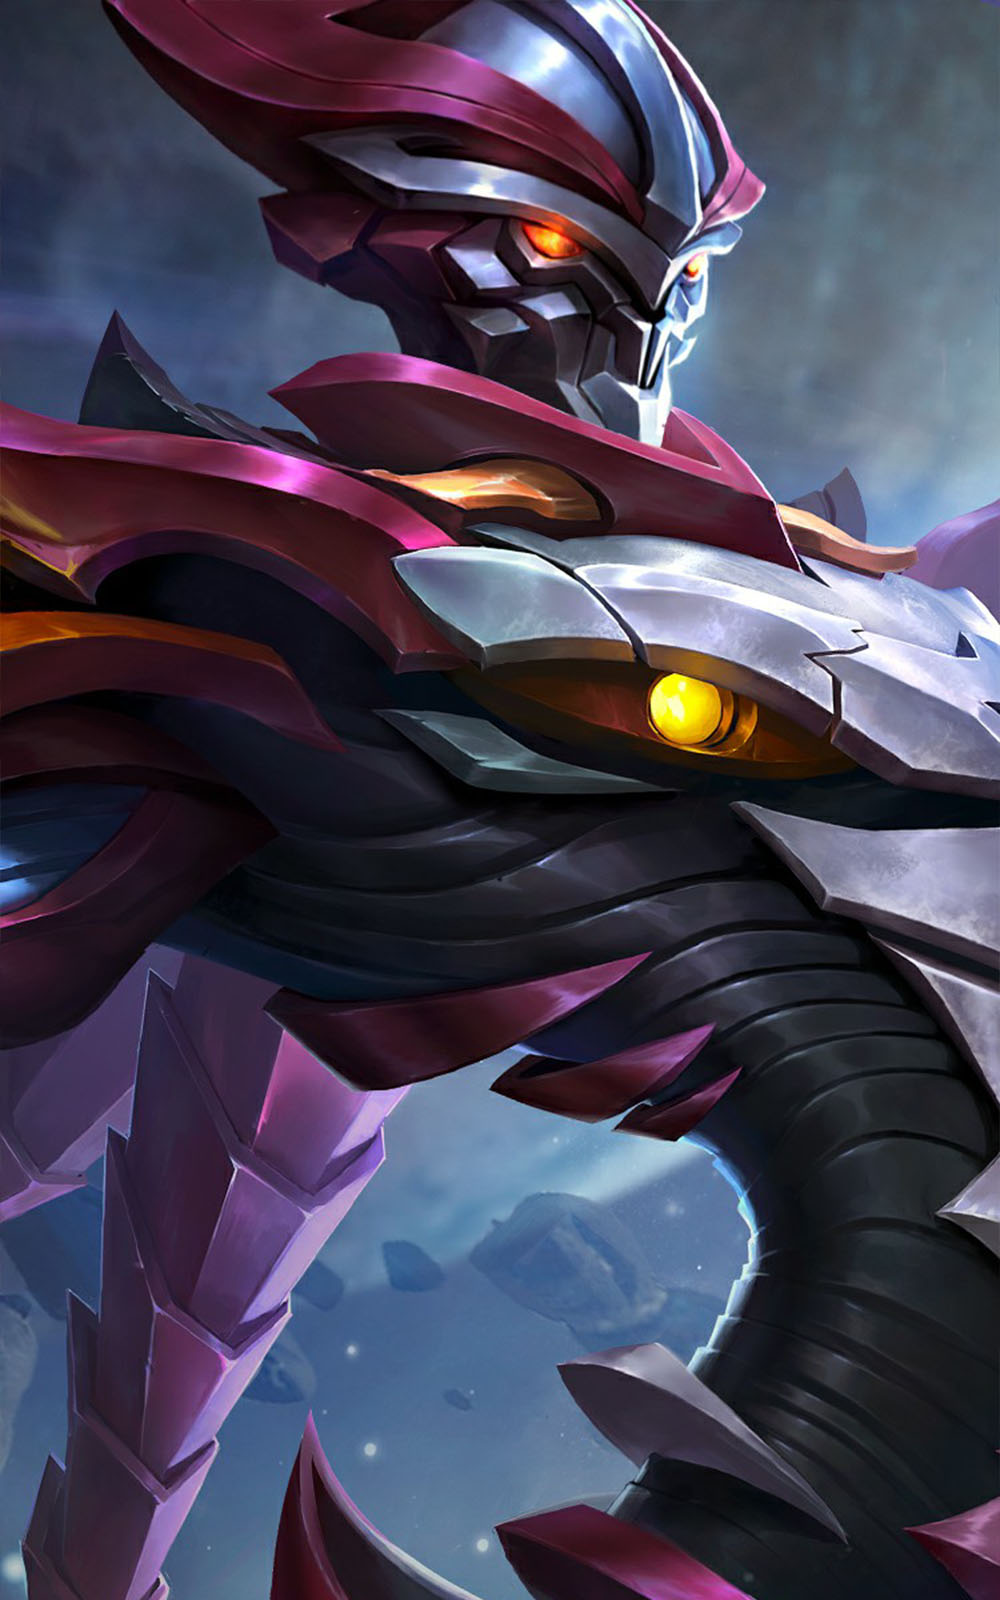 Download Crystallized Predator Zhask Mobile Legends Free